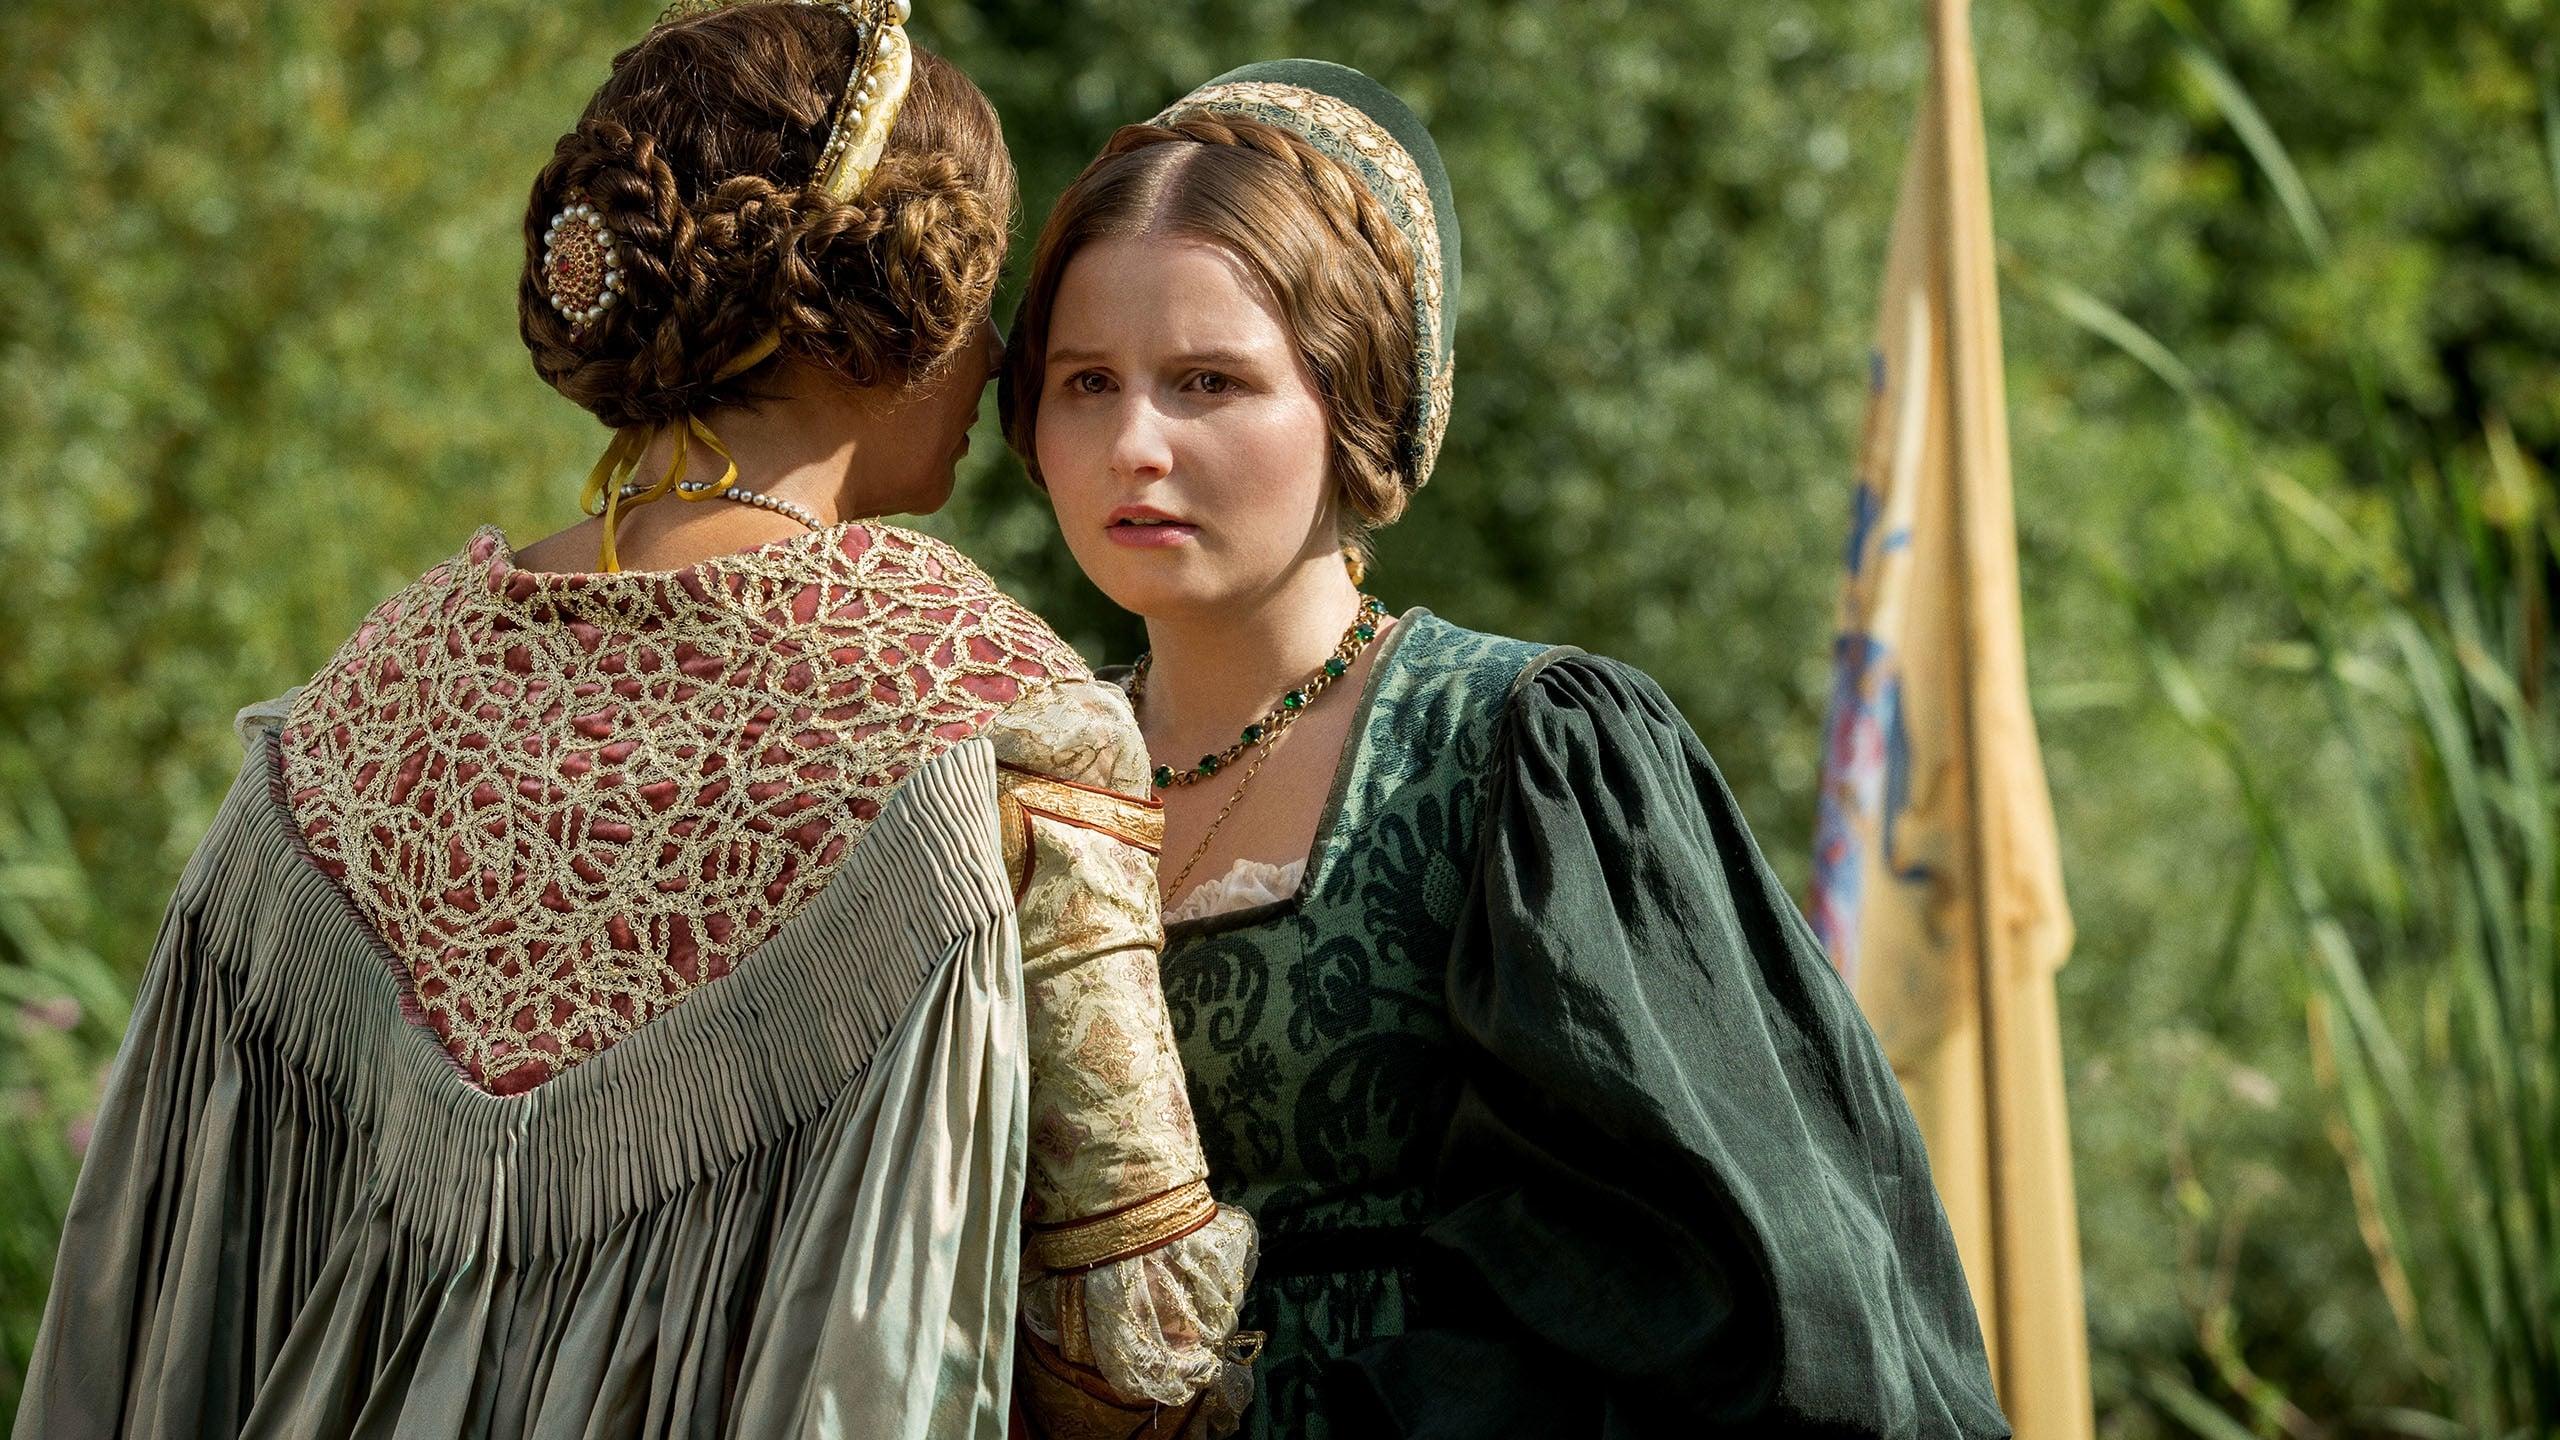 Ver Serie La Princesa Blanca Temporada 1 Capitulo 5 Online Latino Hd Pelisplus